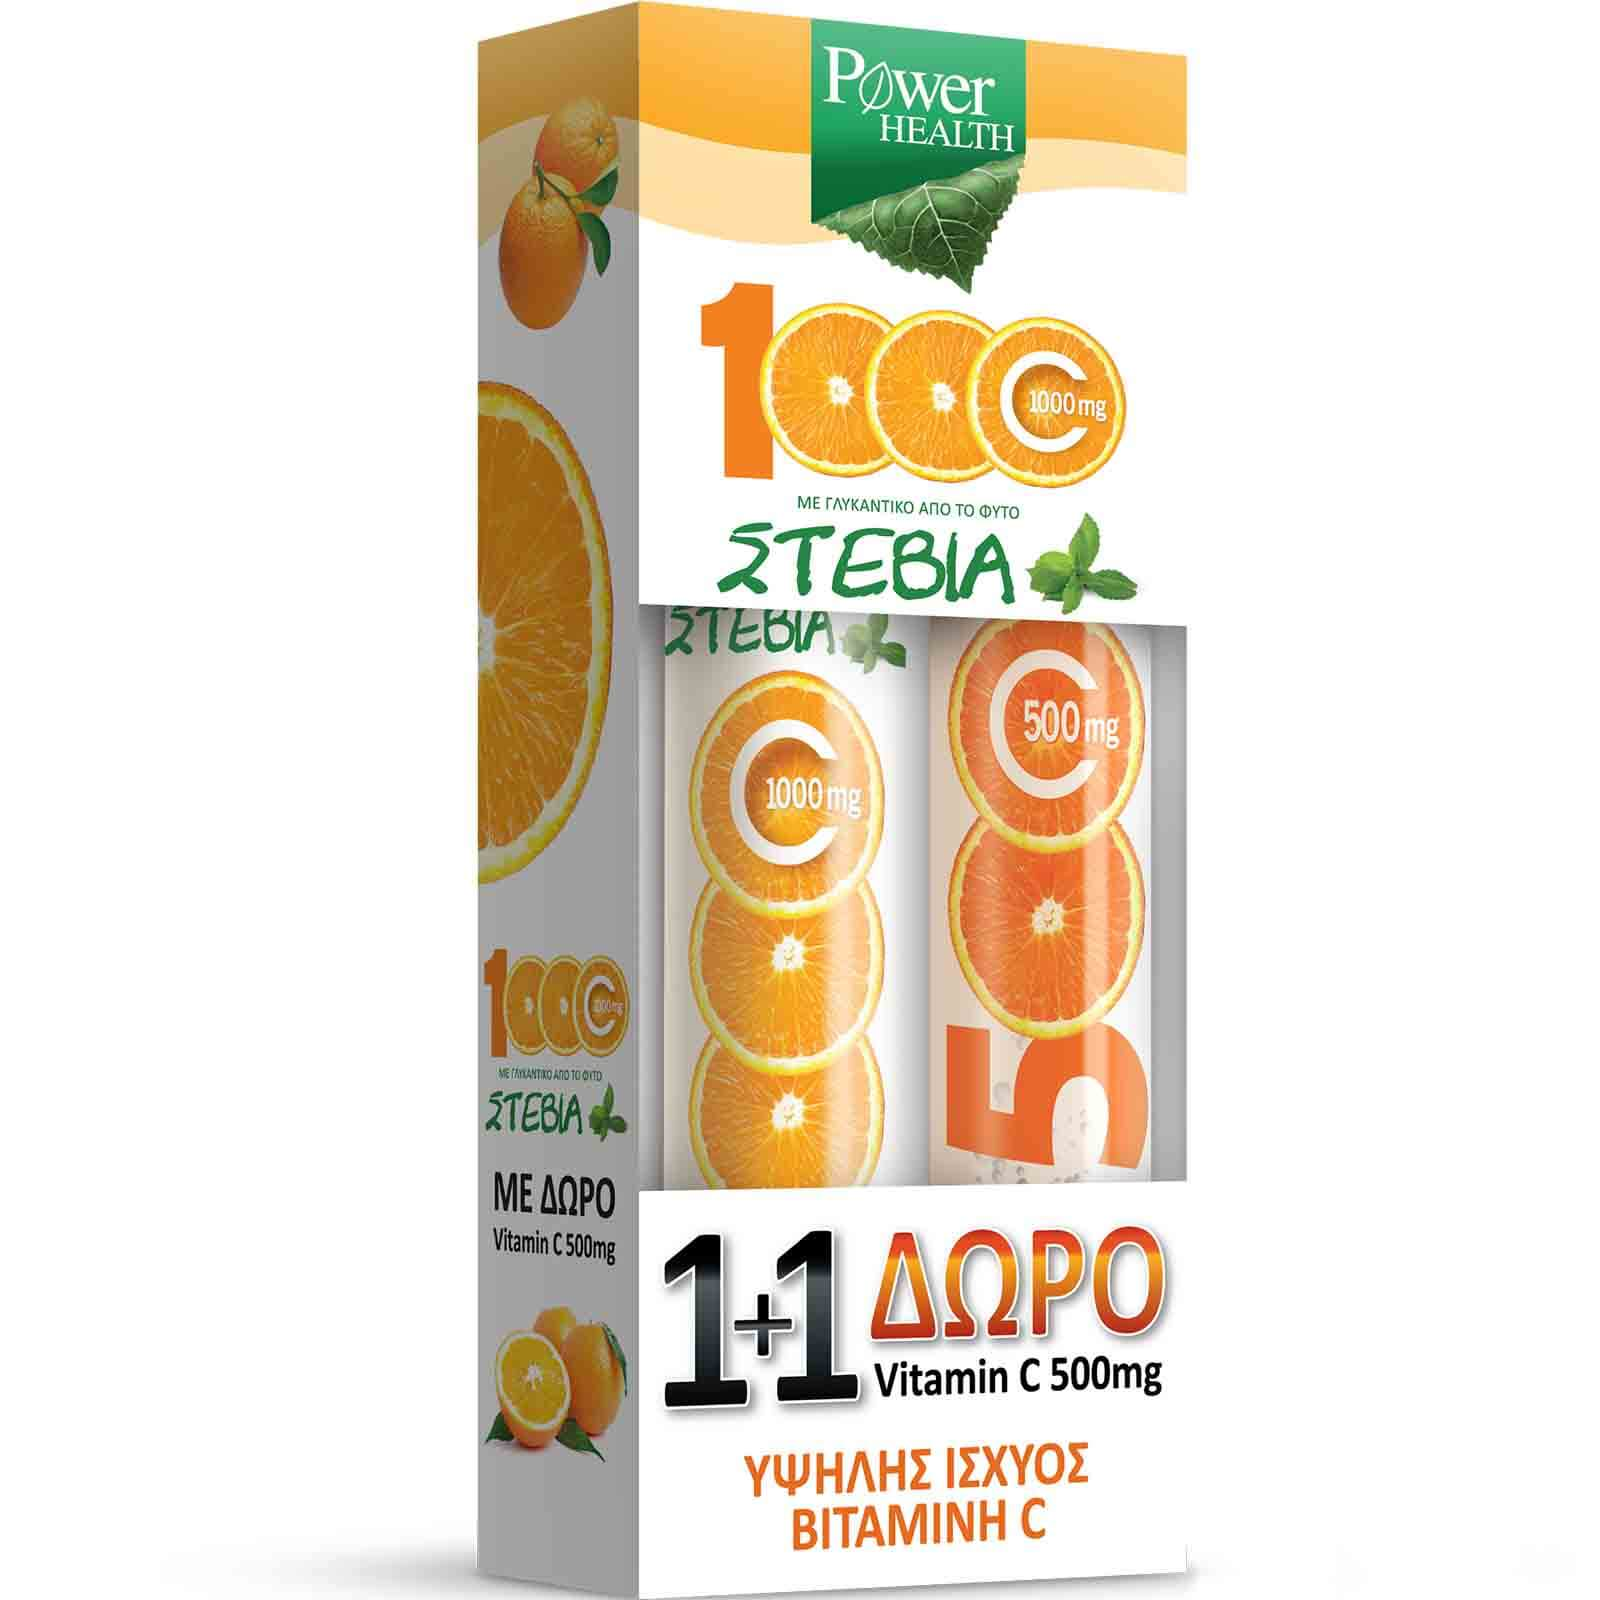 Power Health Vitamin C 1.000mg με Στέβια 24 Effer.Tabs & Βιταμίνη C 500mg 20Effer.Tabs 1+1 Δώρο